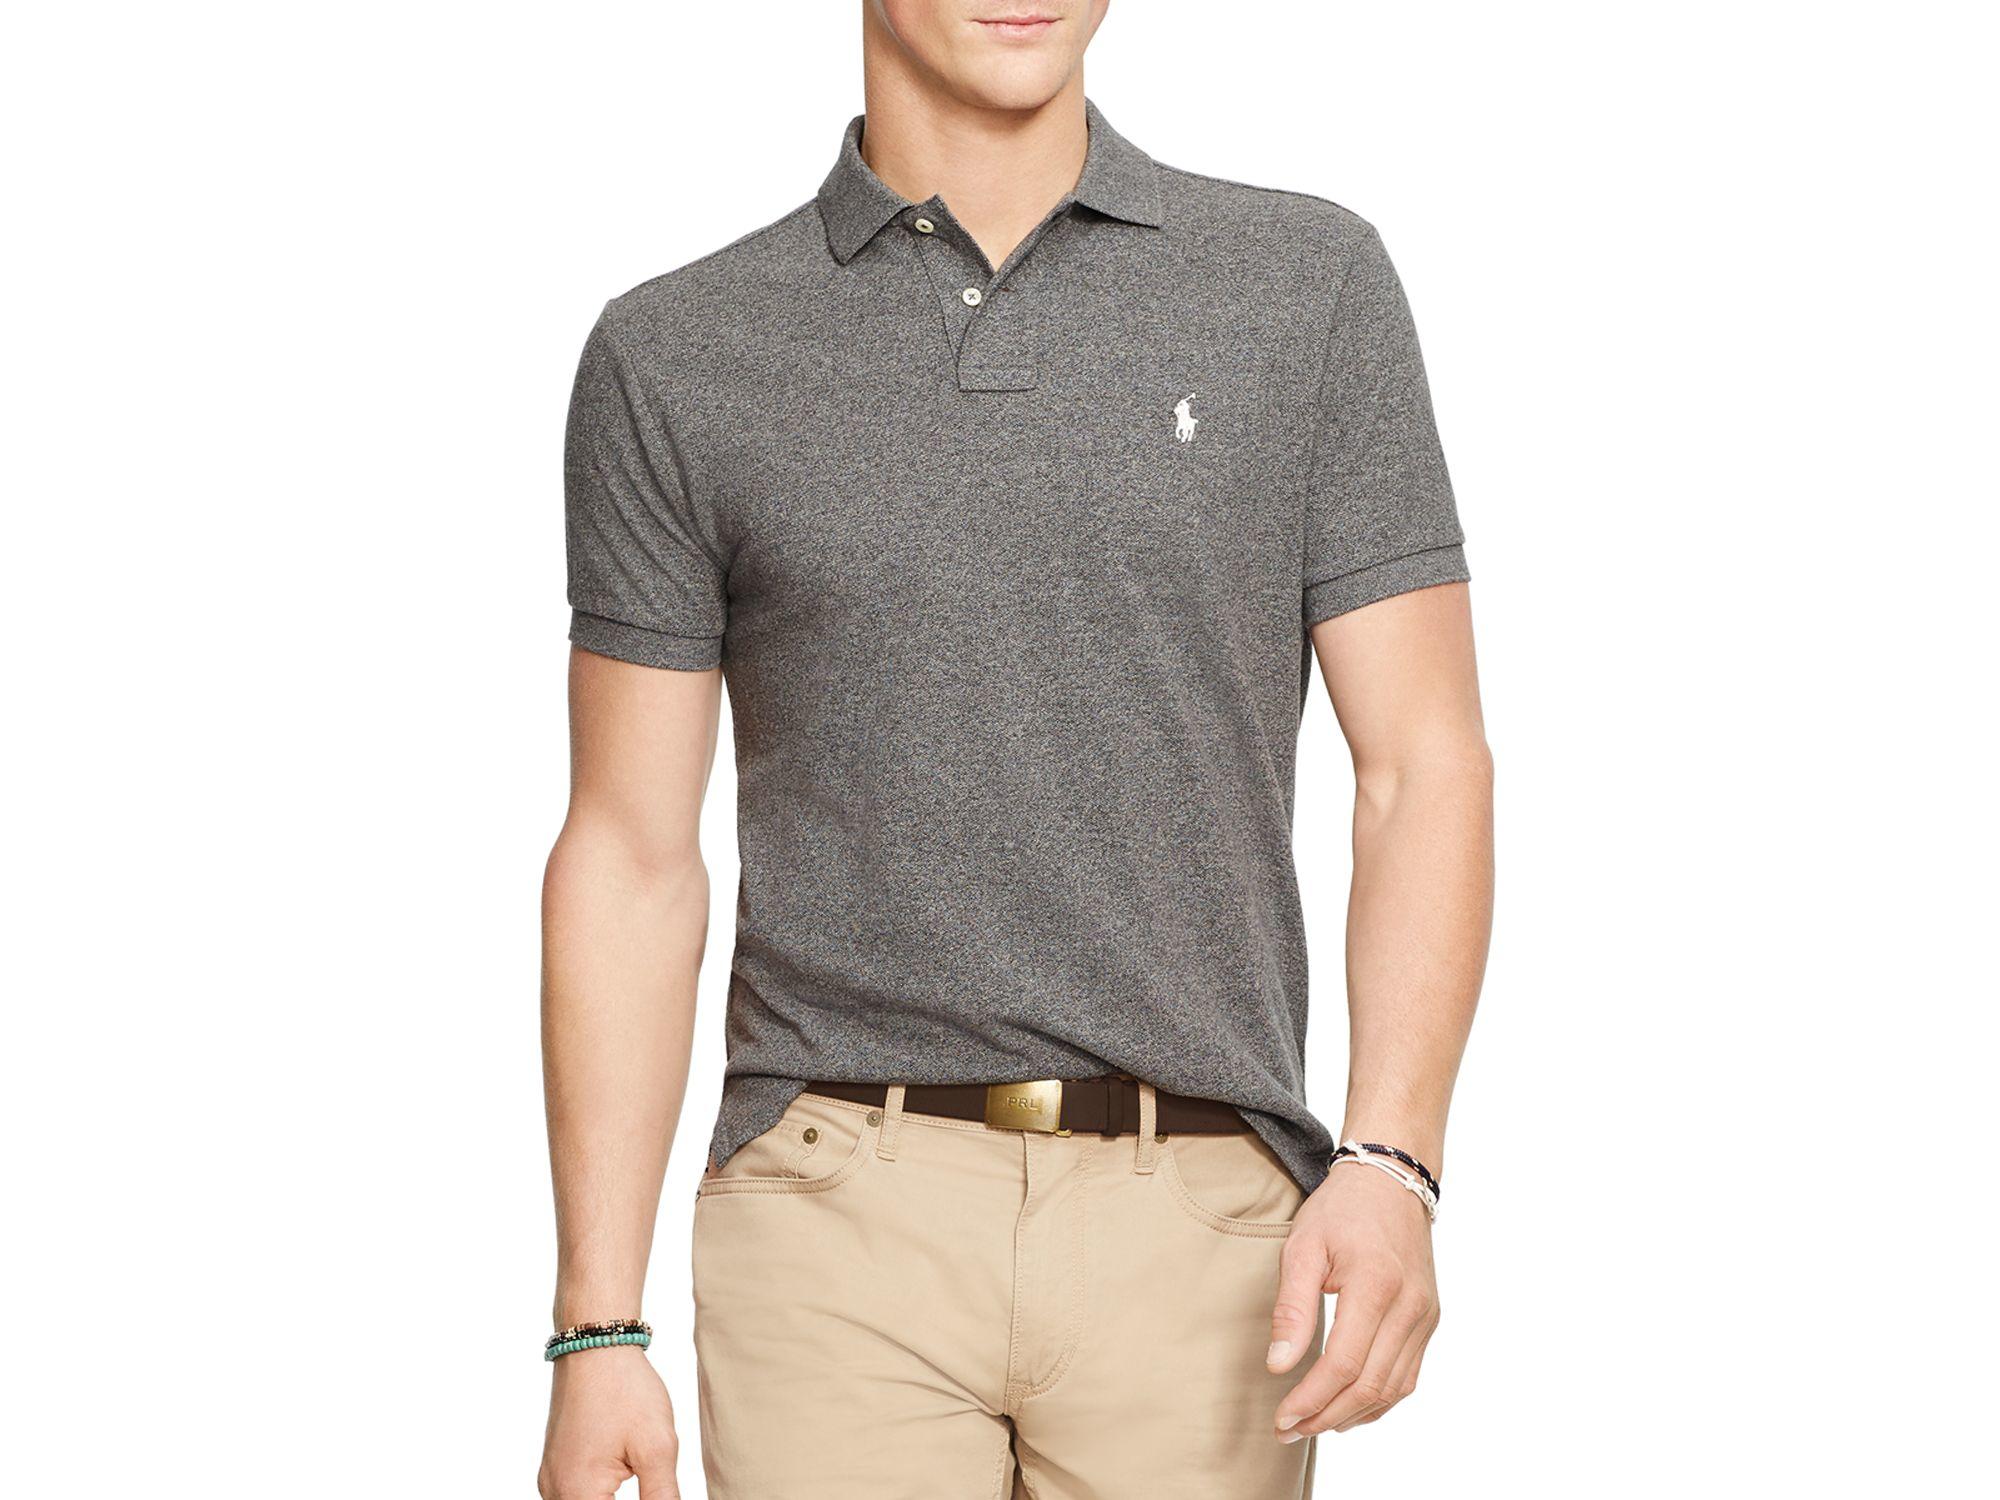 ca117738 Polo Ralph Lauren Slim Fit Mesh Polo Shirt in Gray for Men - Lyst